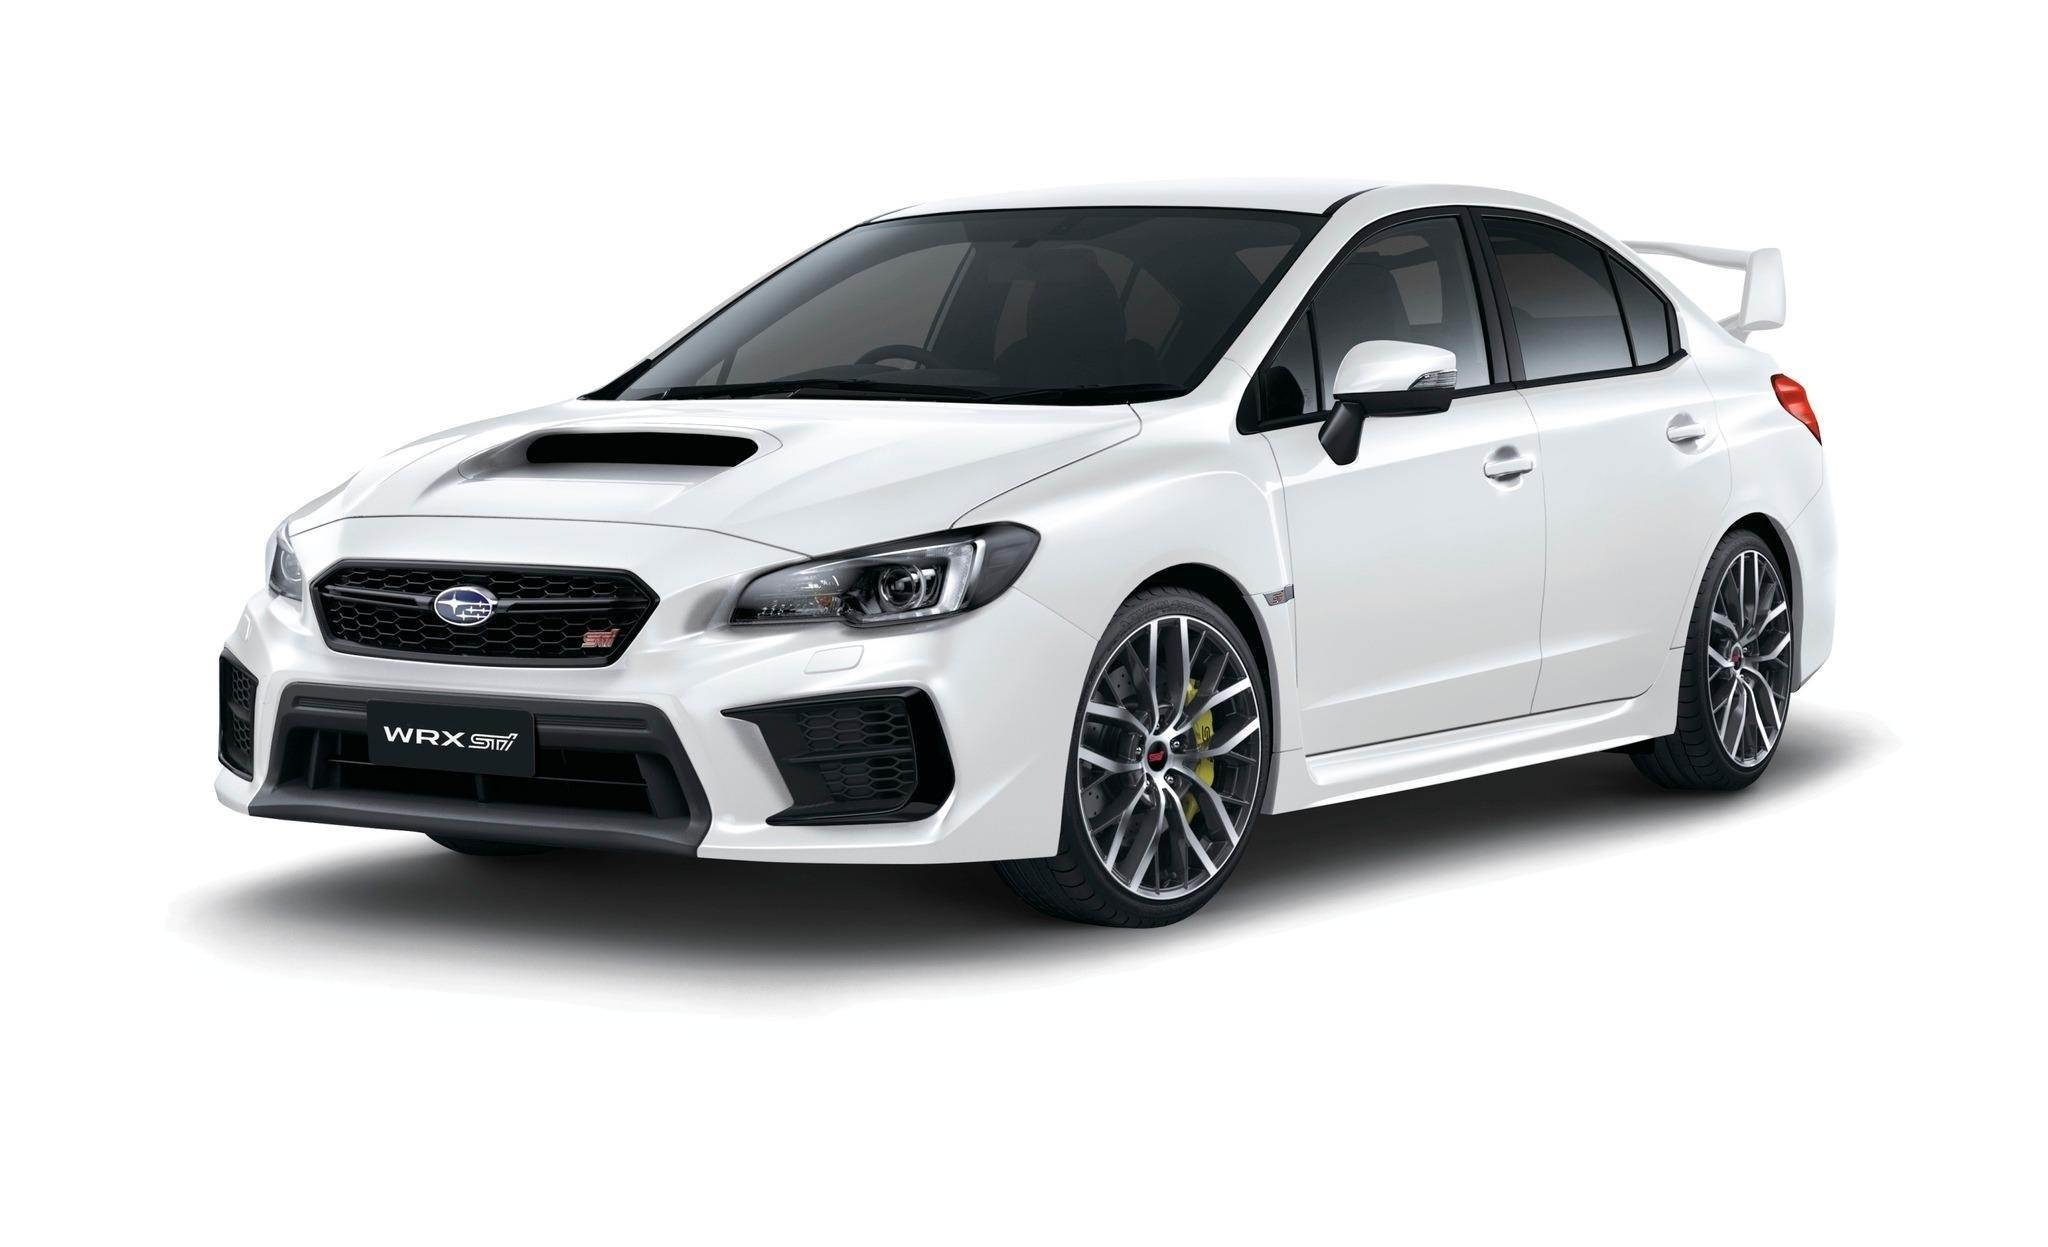 2021 Subaru WRX STi MY21 / 6 Speed Manual / Sedan / 2.5L / 4 Cylinder TURBO / Petrol / 4x4 / 4 door / Model Year '21 August release 07WX21